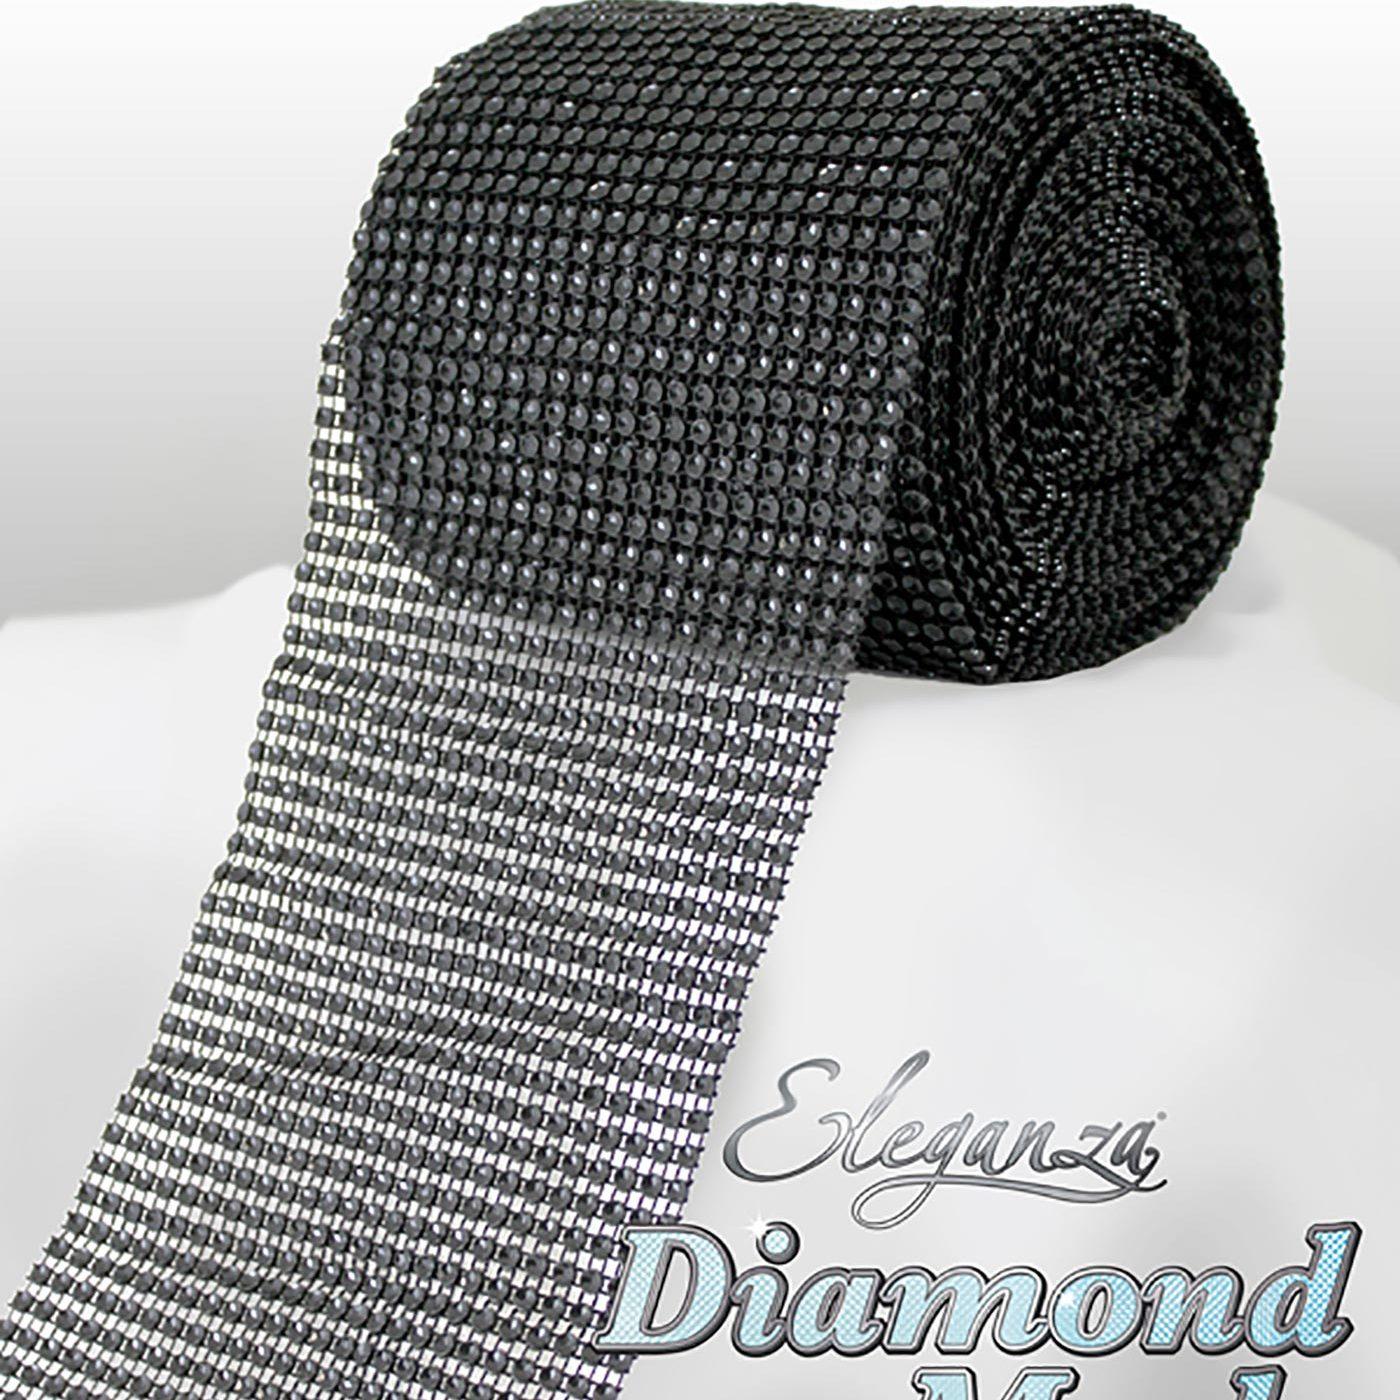 Eleganza Diamond Mesh 12cm x 9m Black